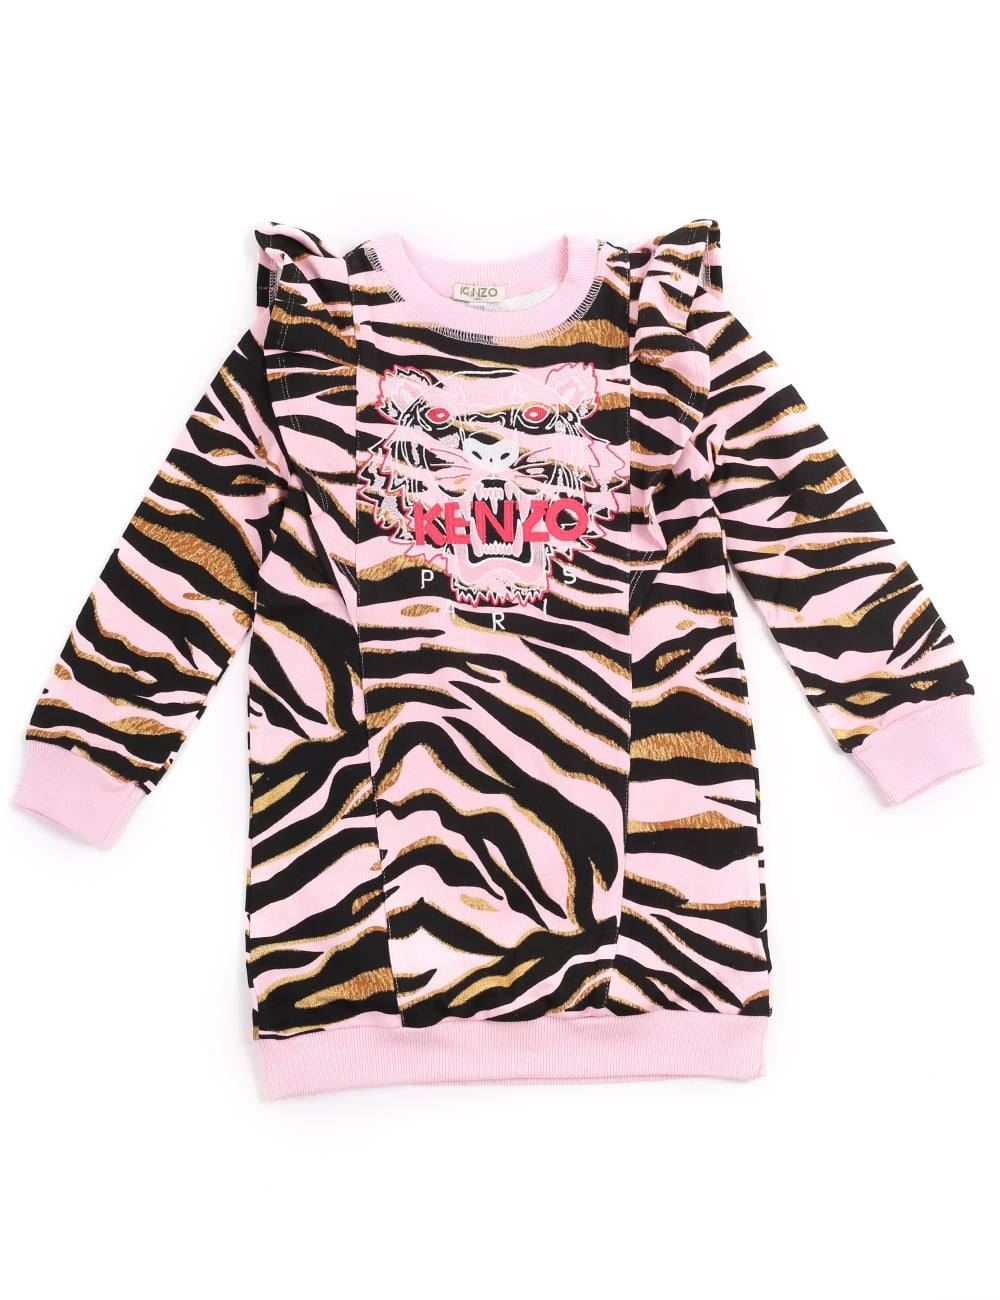 Kenzo Girls Tiger 12 SweaterDress 979da72f2ce7